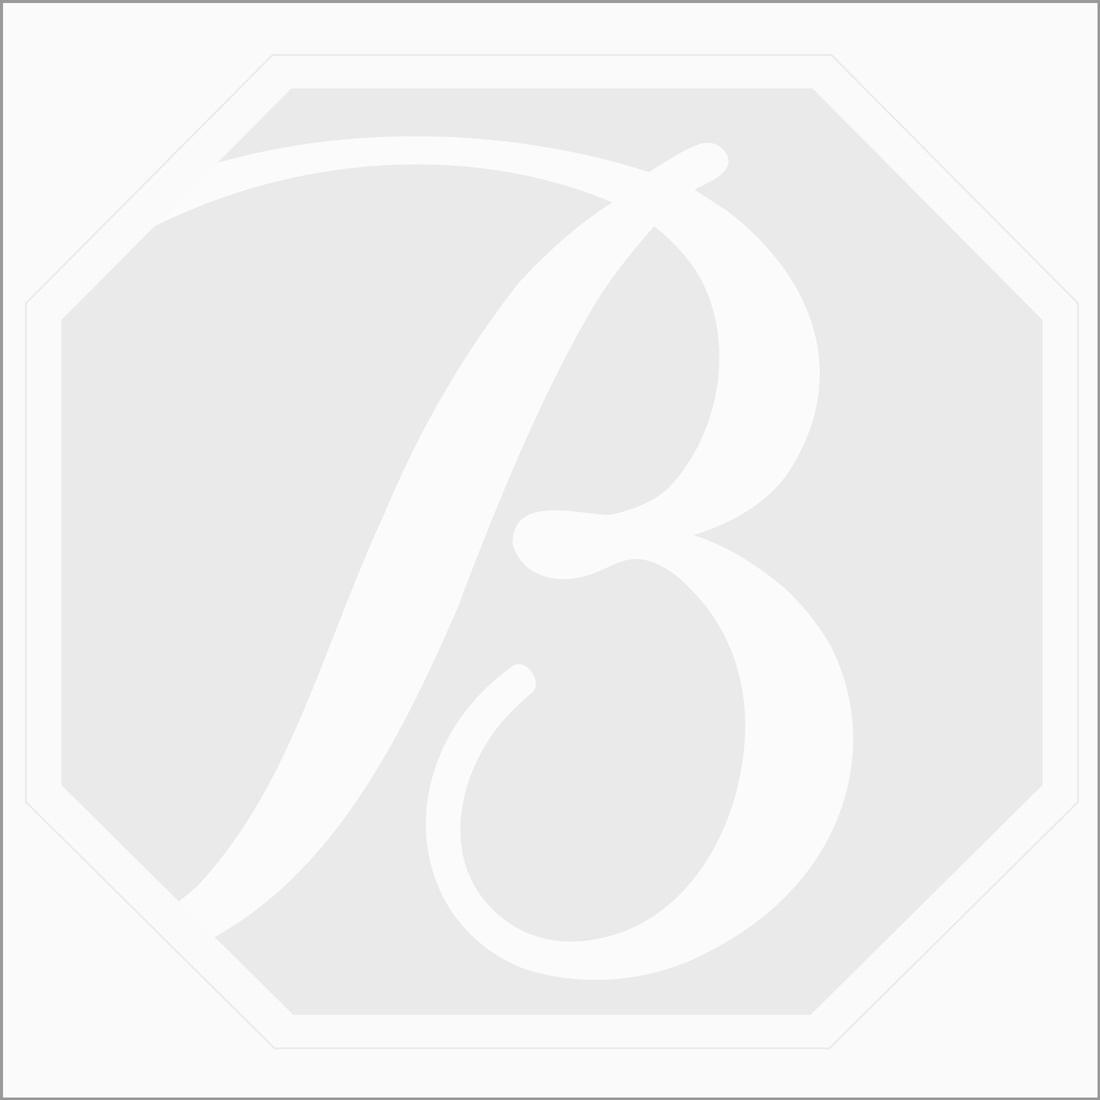 4 Pcs - 9.52 ct. -Medium Blue Aquamarine Oval Cabochon - 8.8 x 7.2 x 4.6 mm to 9.2 x 6.9 x 5 mm (AQCAB1023)